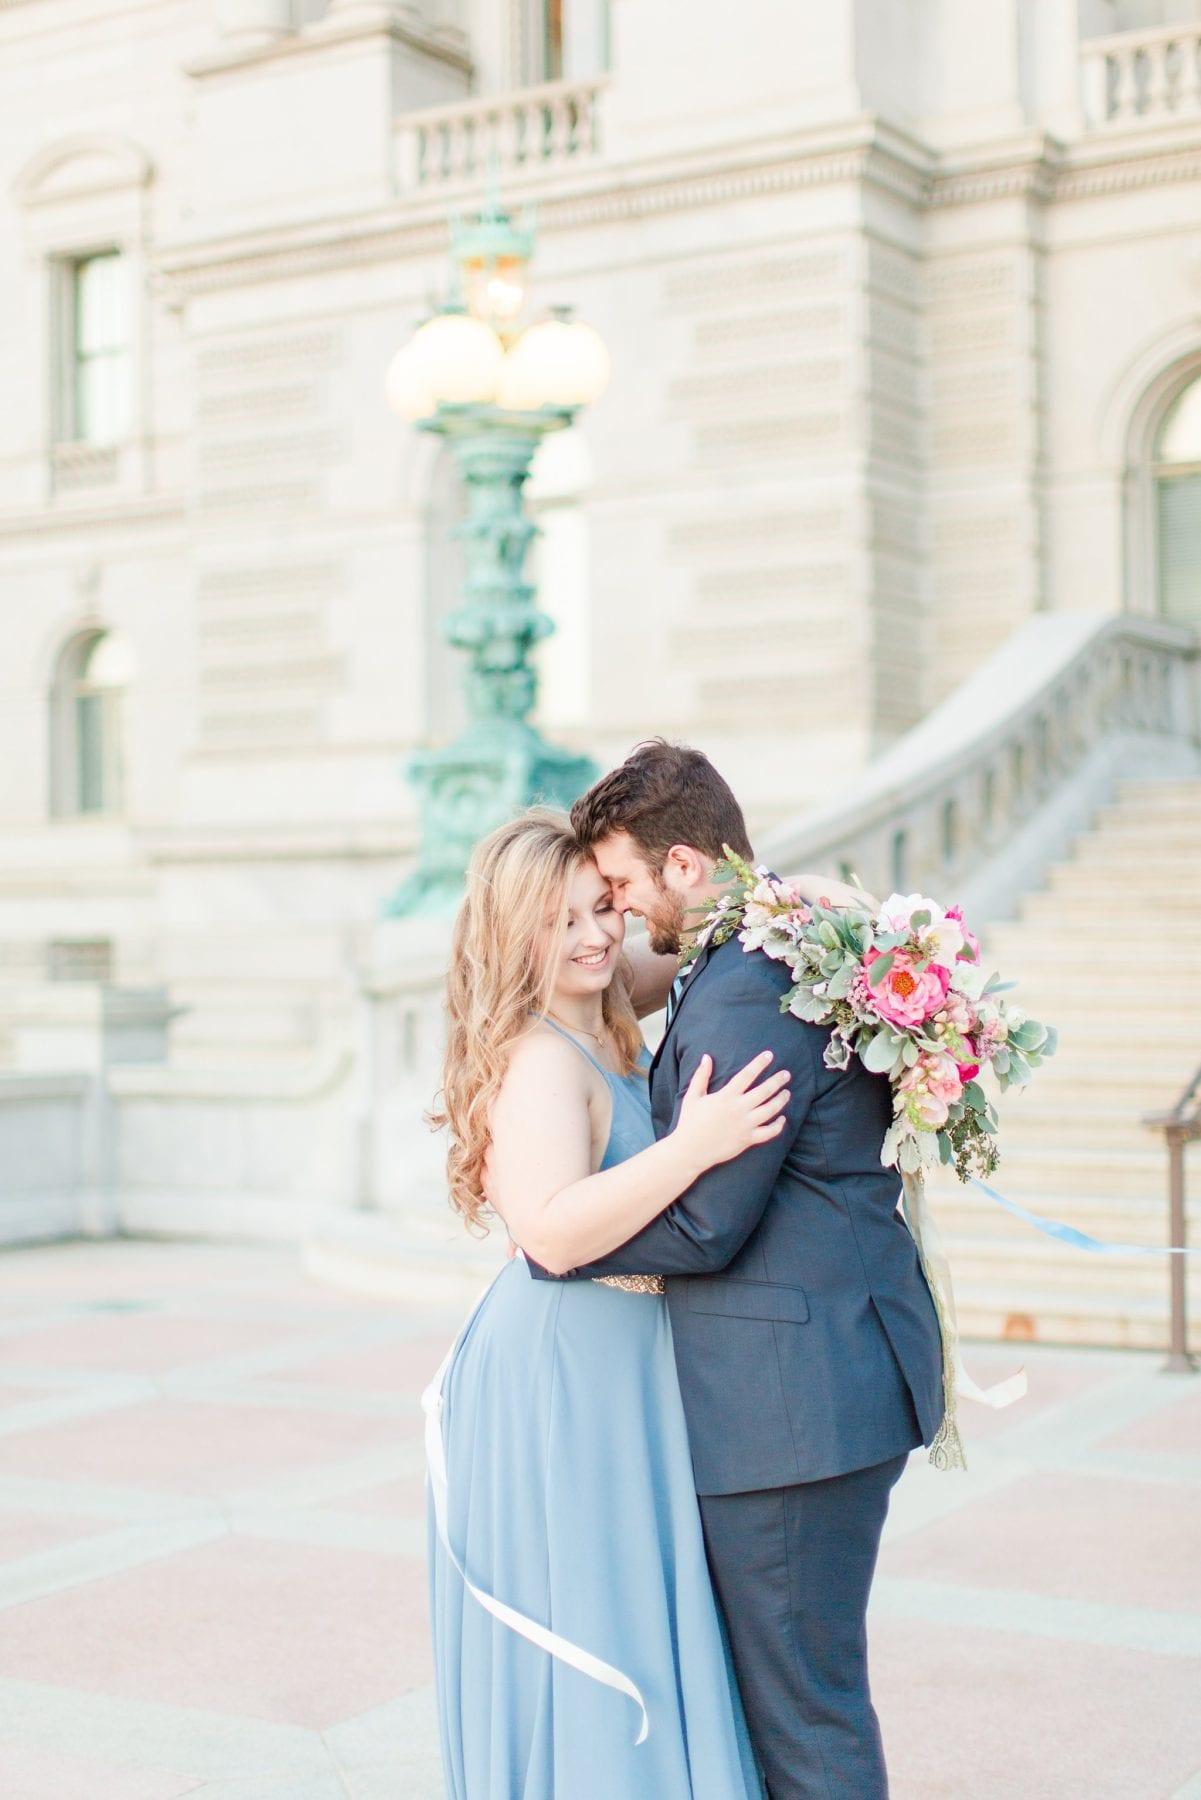 Capitol Hill Engagement Photos Kelly & Zach Washington DC Wedding Photographer Megan Kelsey Photography-334.jpg